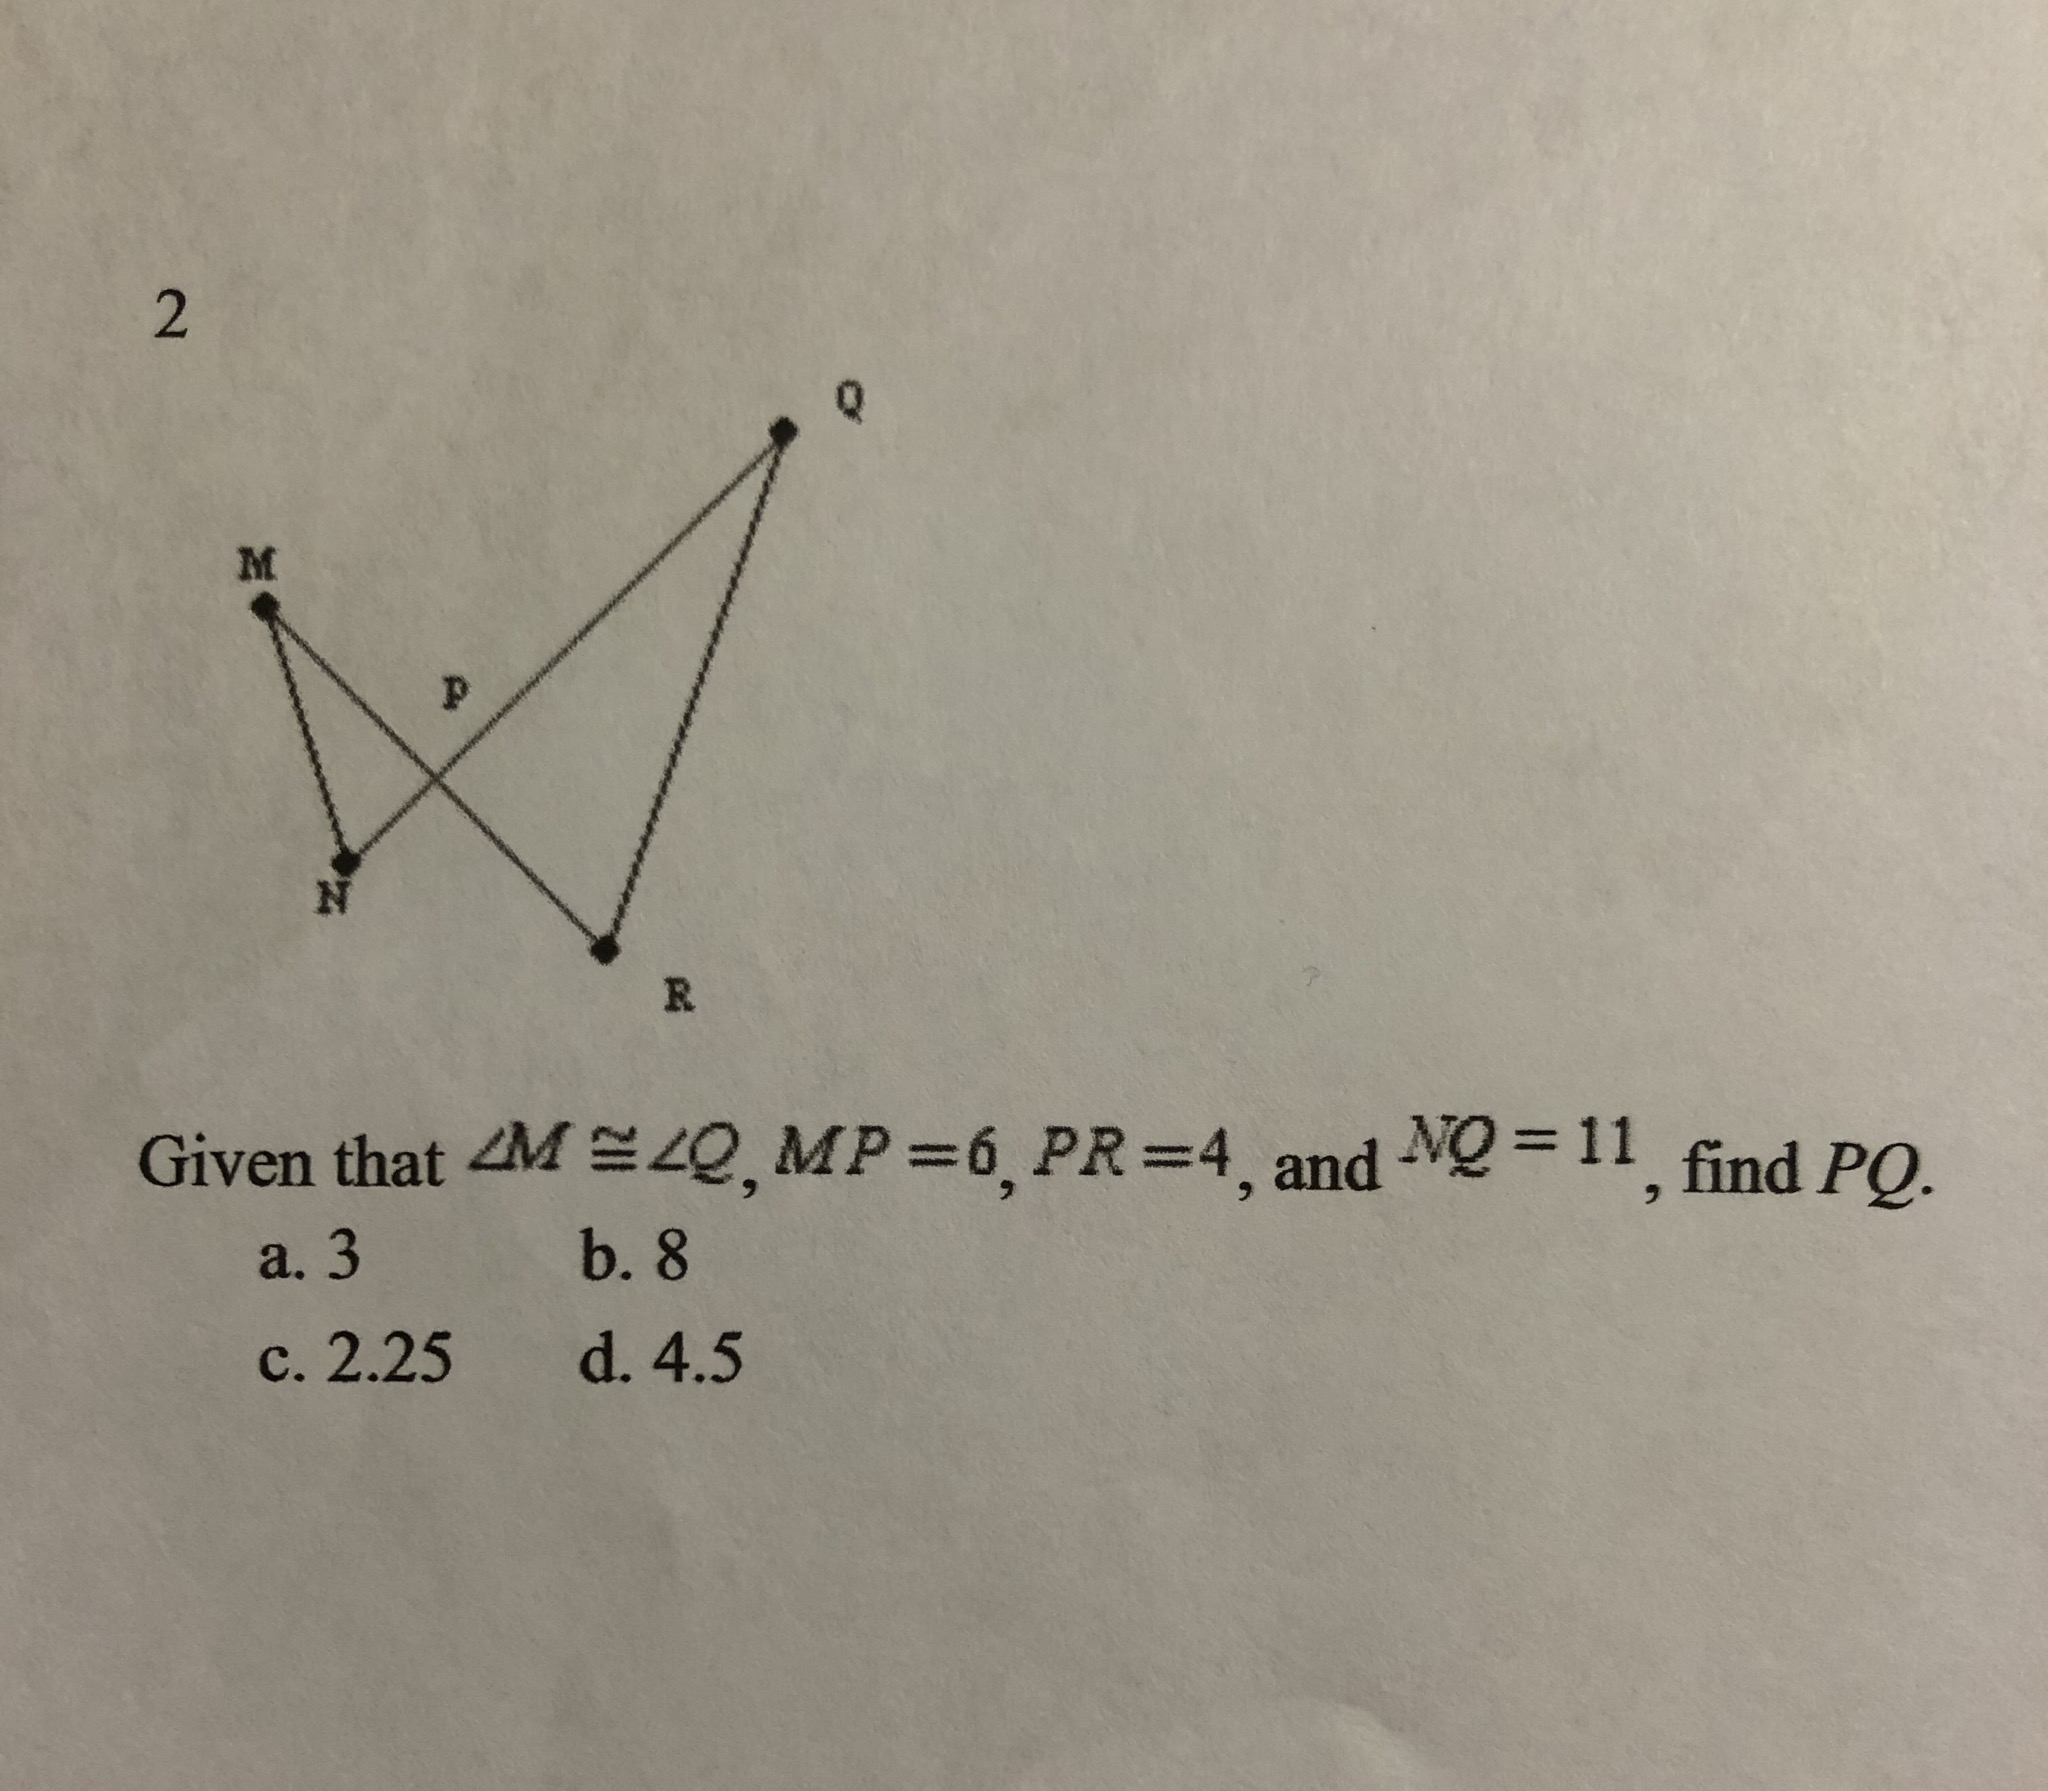 2 M N R Given that 4M 4Q, MP 6, PR =4, and NQ-11, find PO. b. 8 a. 3 c. 2.25 d. 4.5